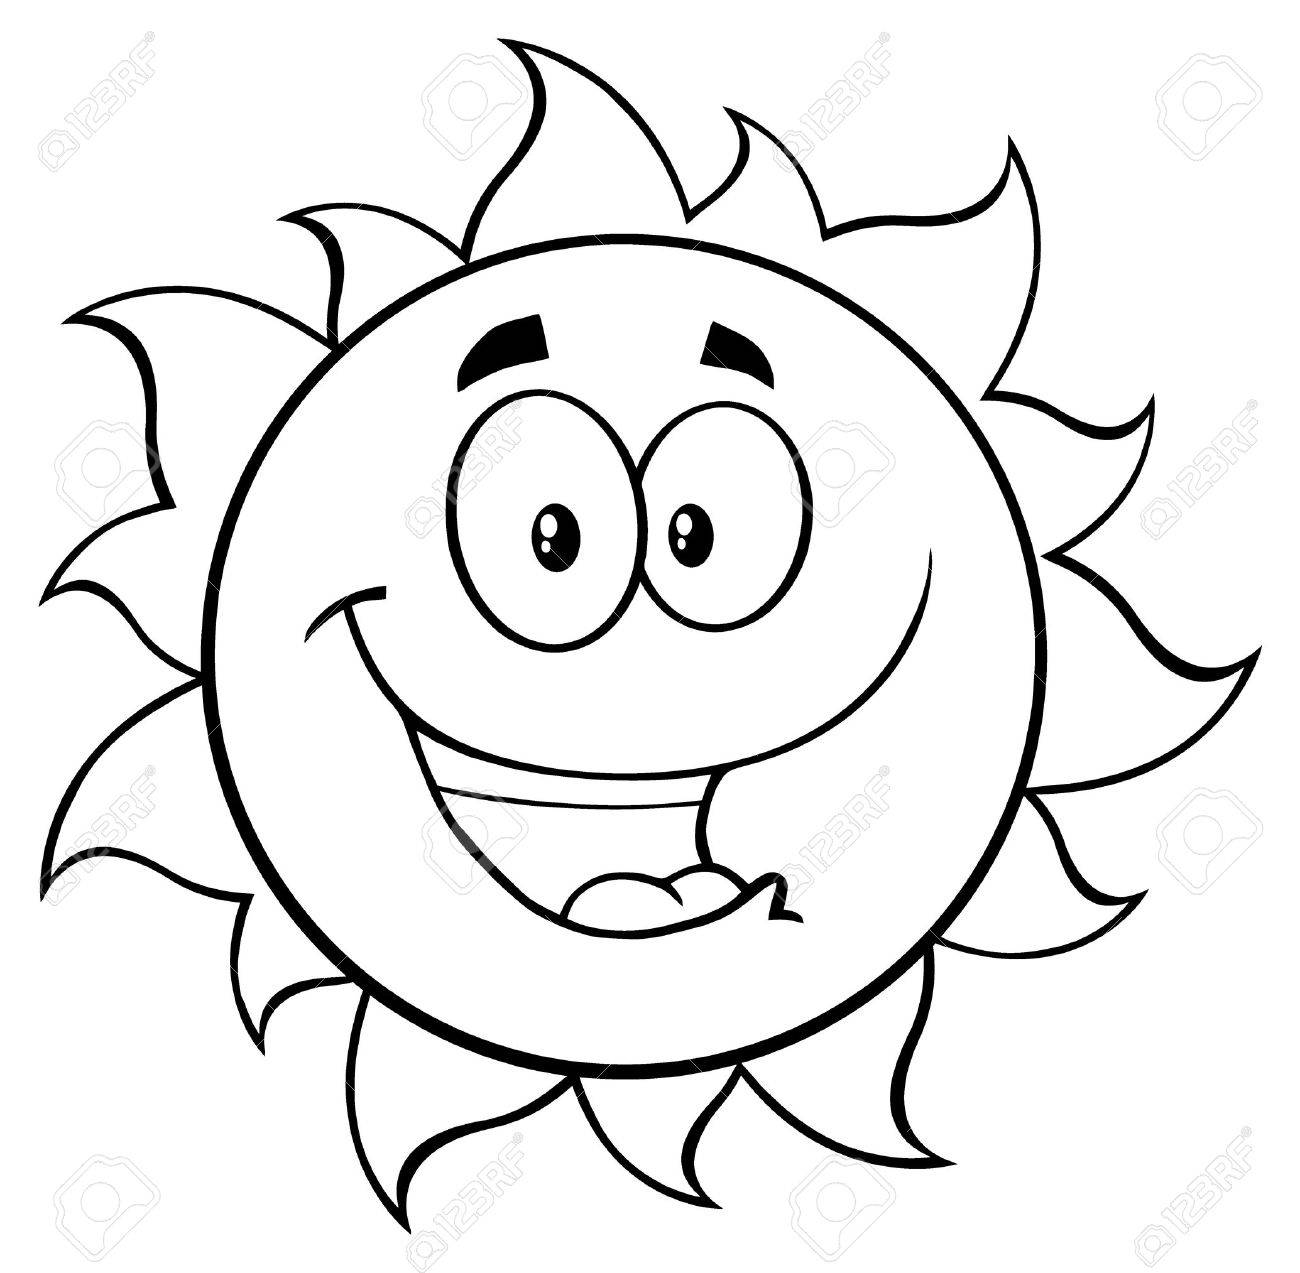 1300x1273 Black And White Happy Sun Cartoon Mascot Character. Illustration